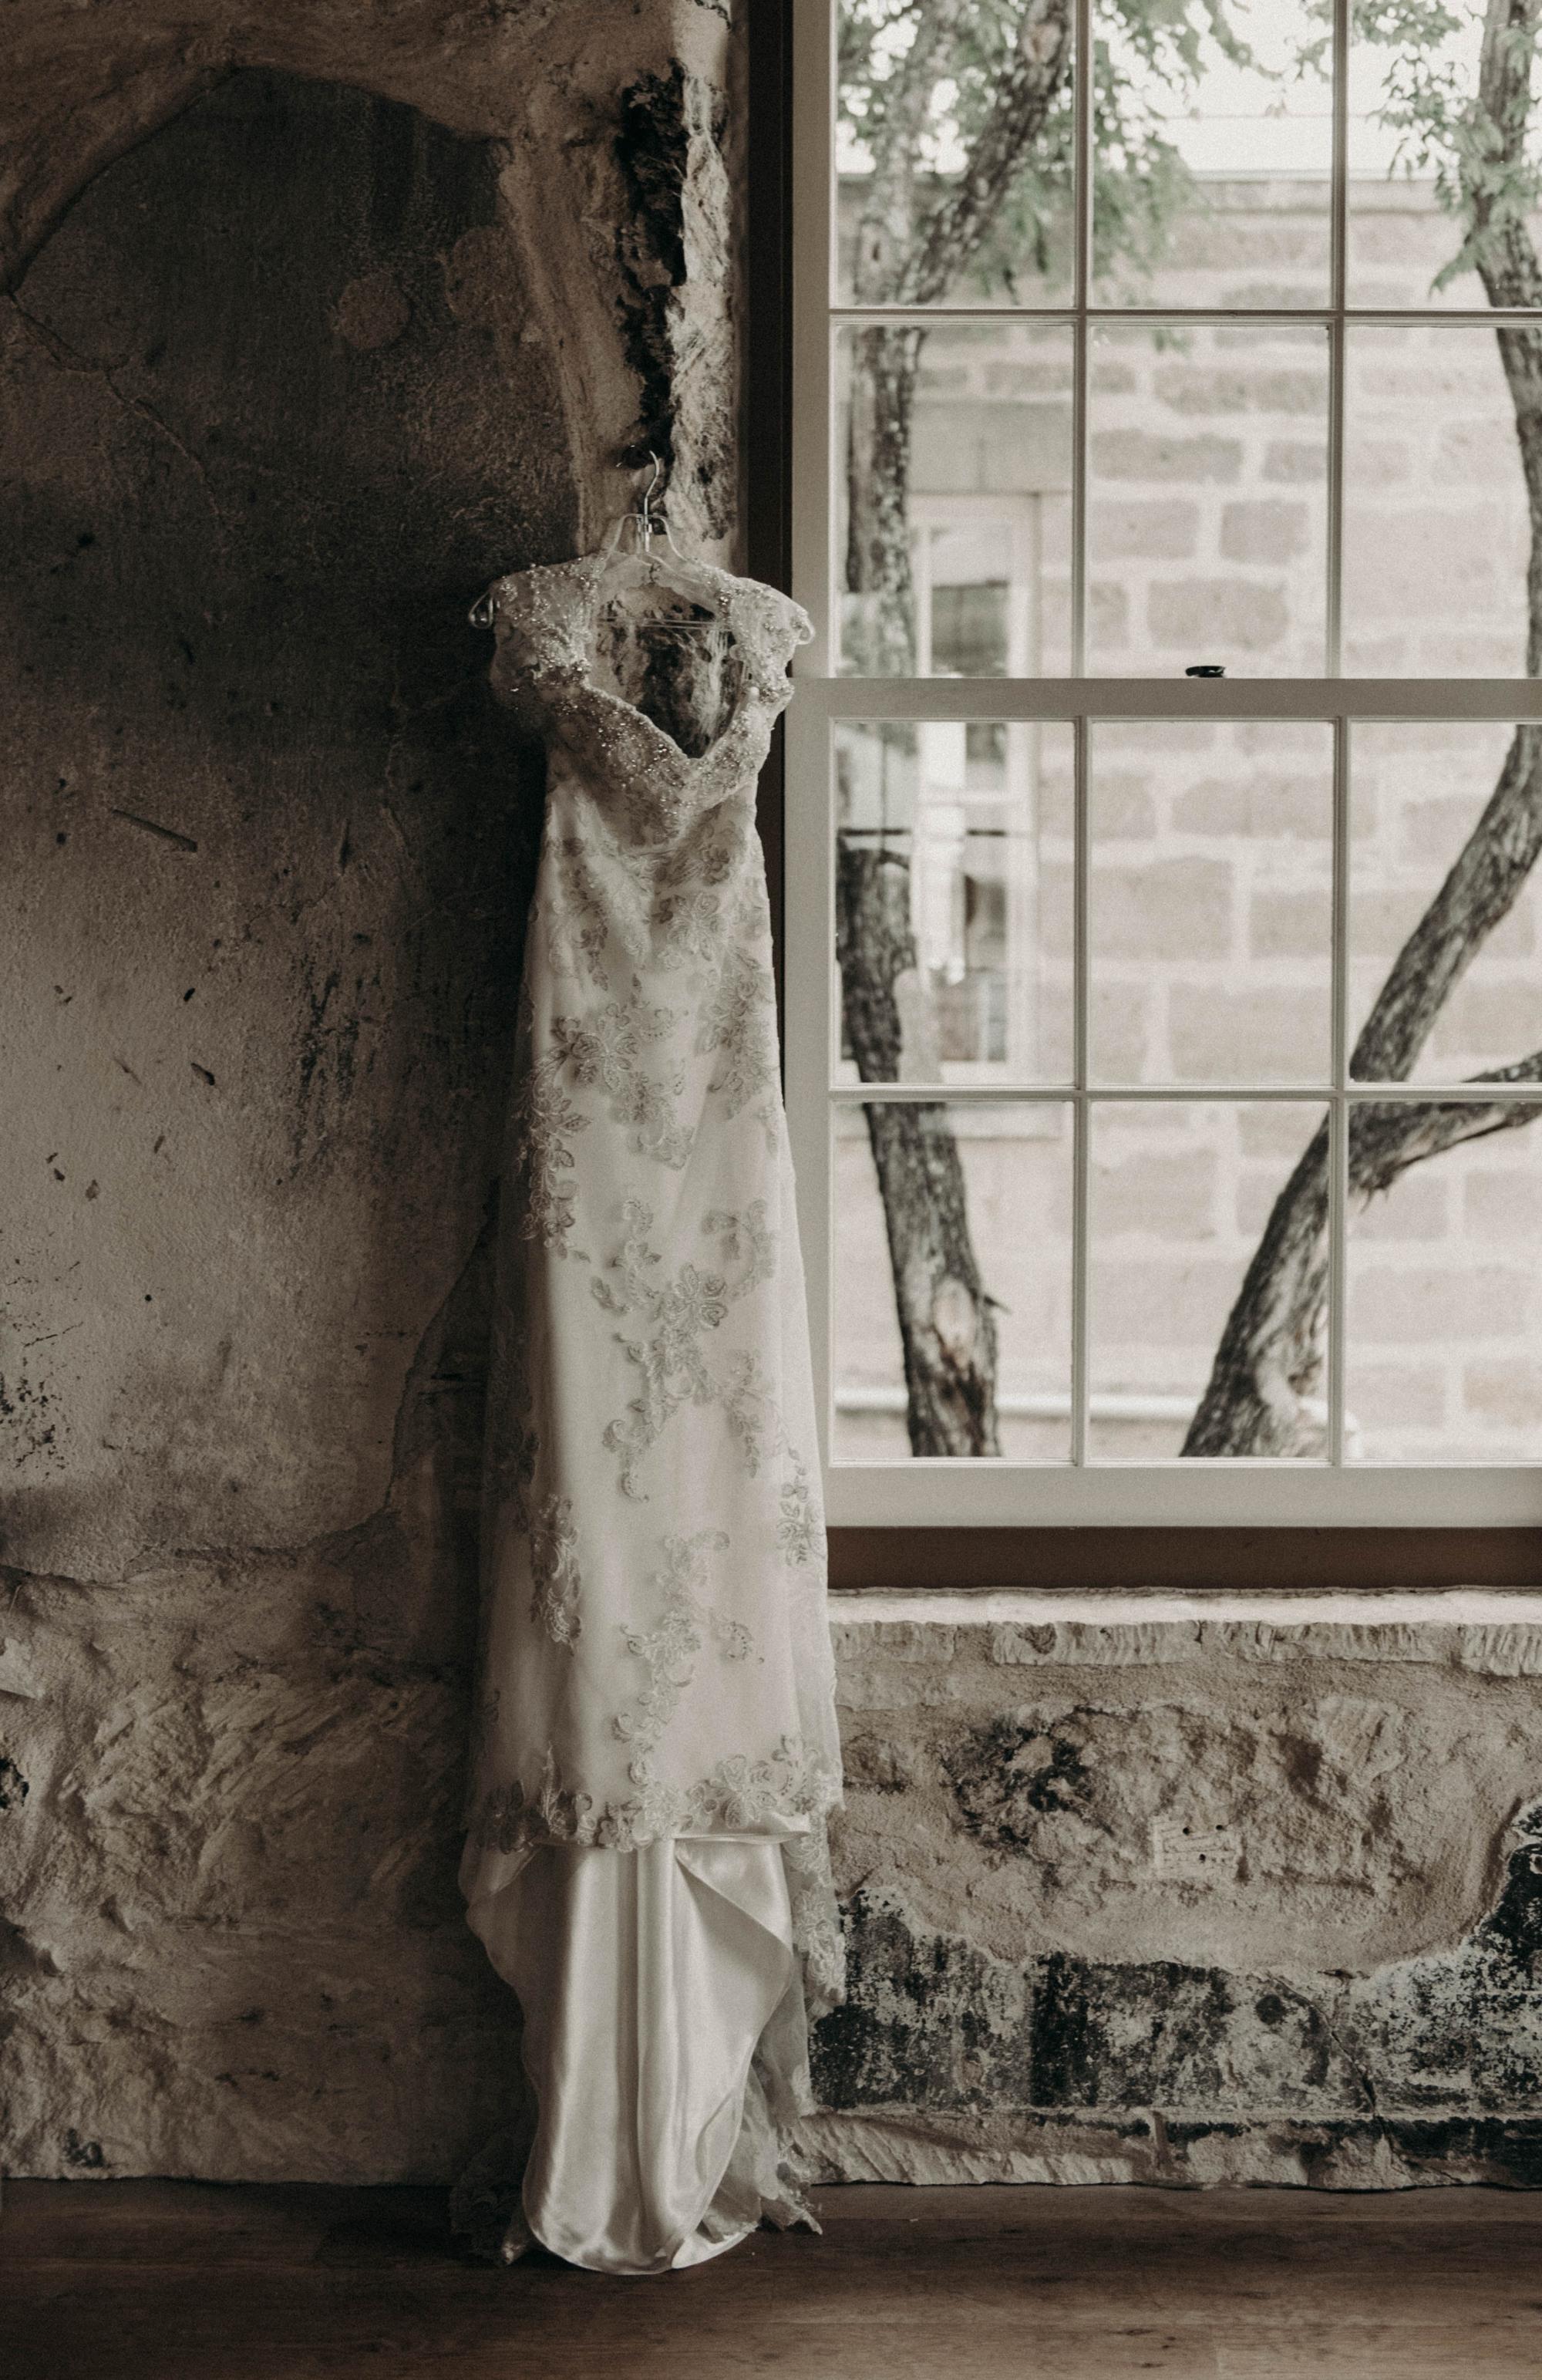 austin-texas-wedding-photography-1778-photographie-4.jpg